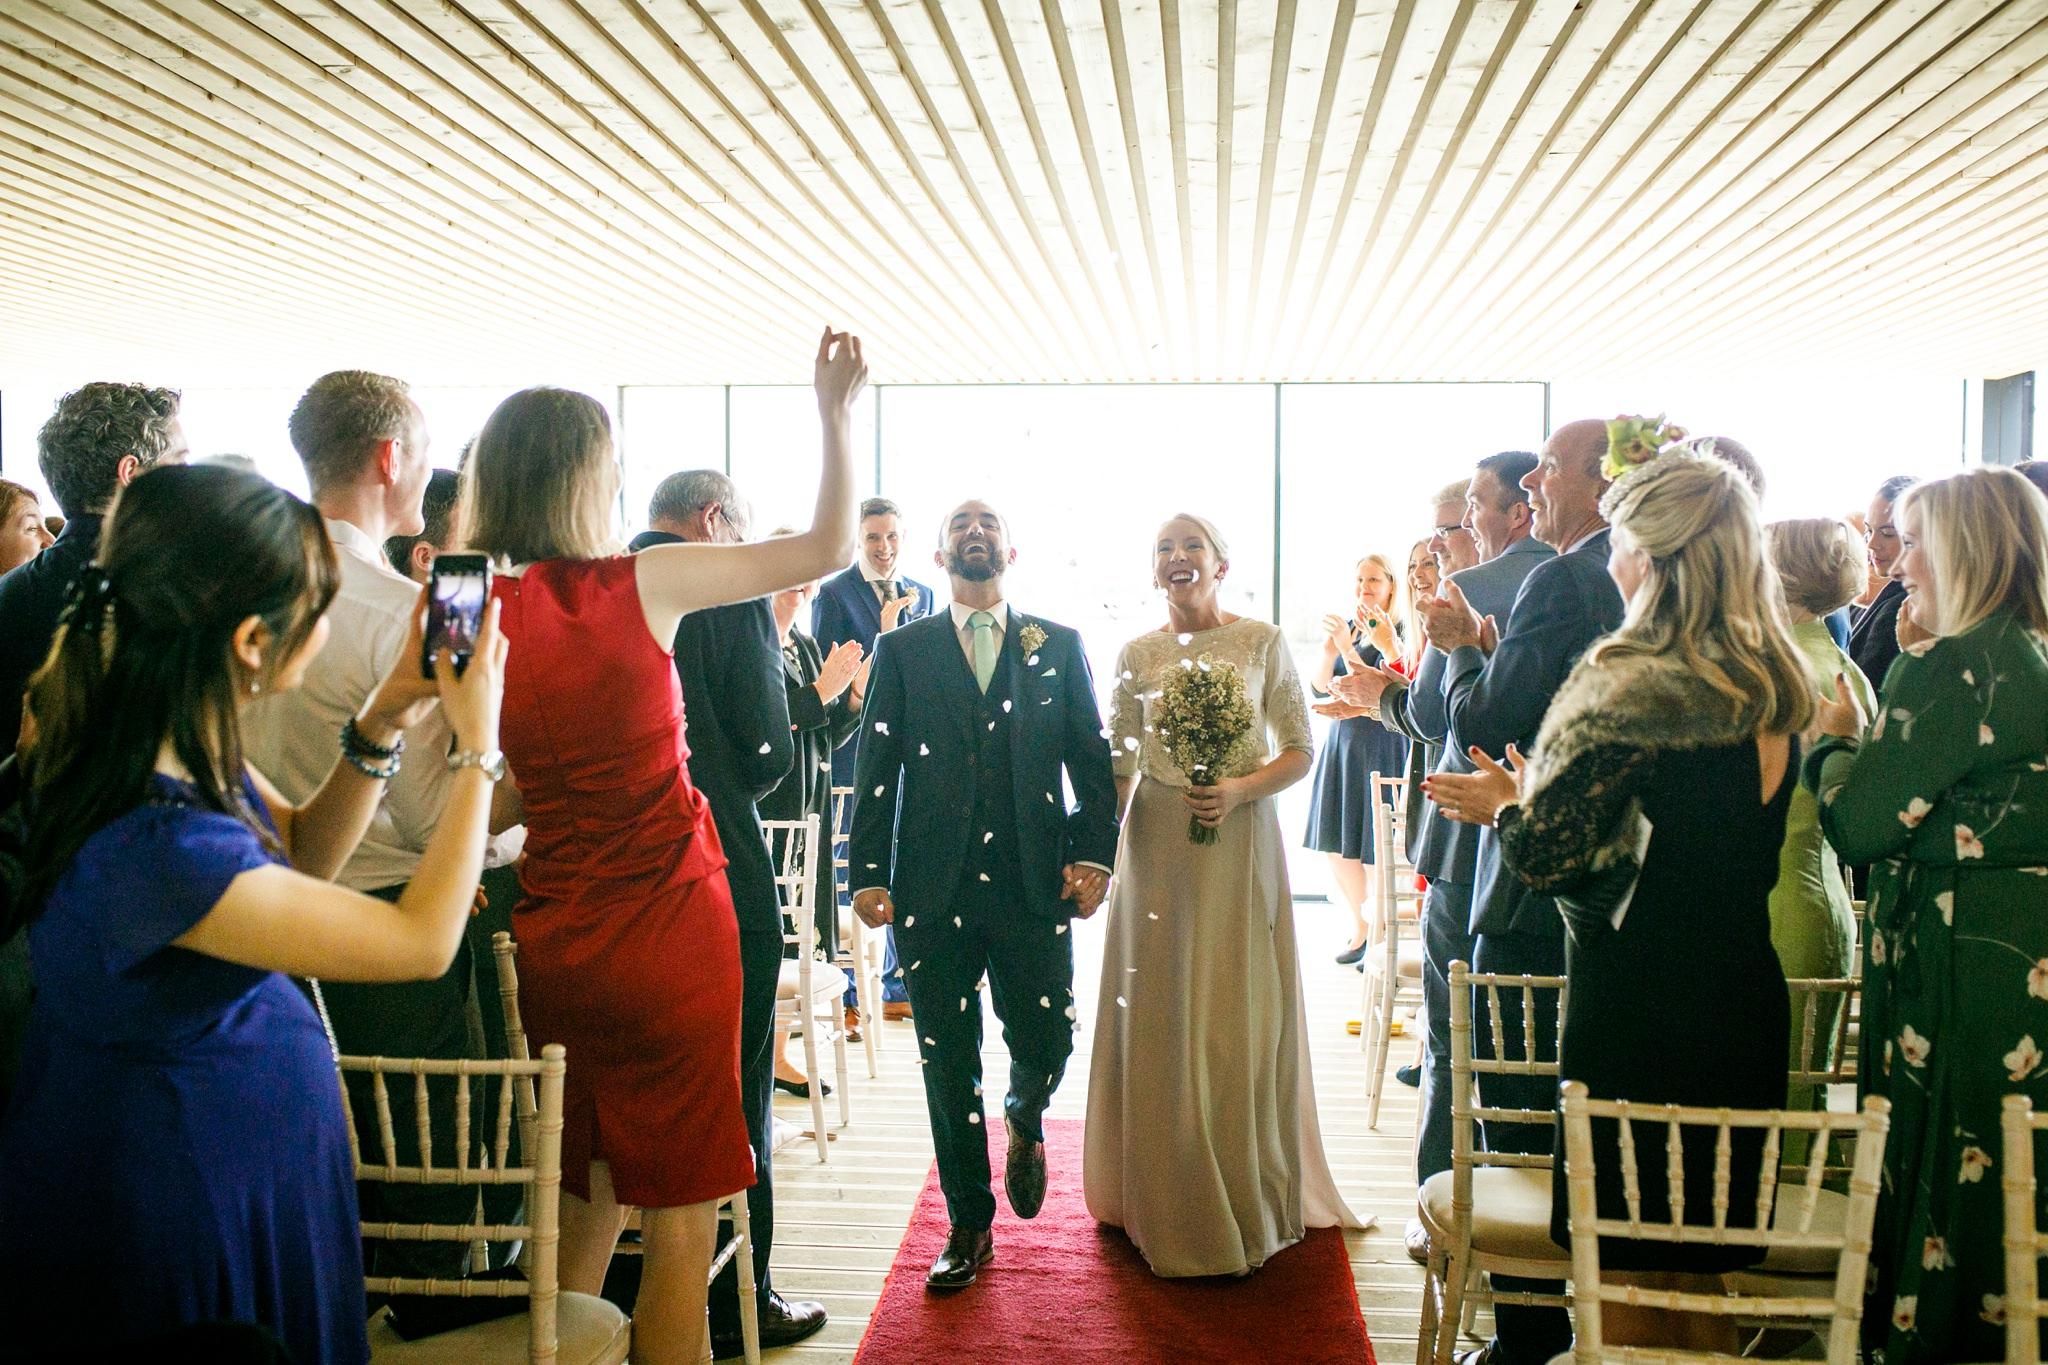 Elisha-Clarke-Photography-Dublin-City-Wedding_0076.jpg